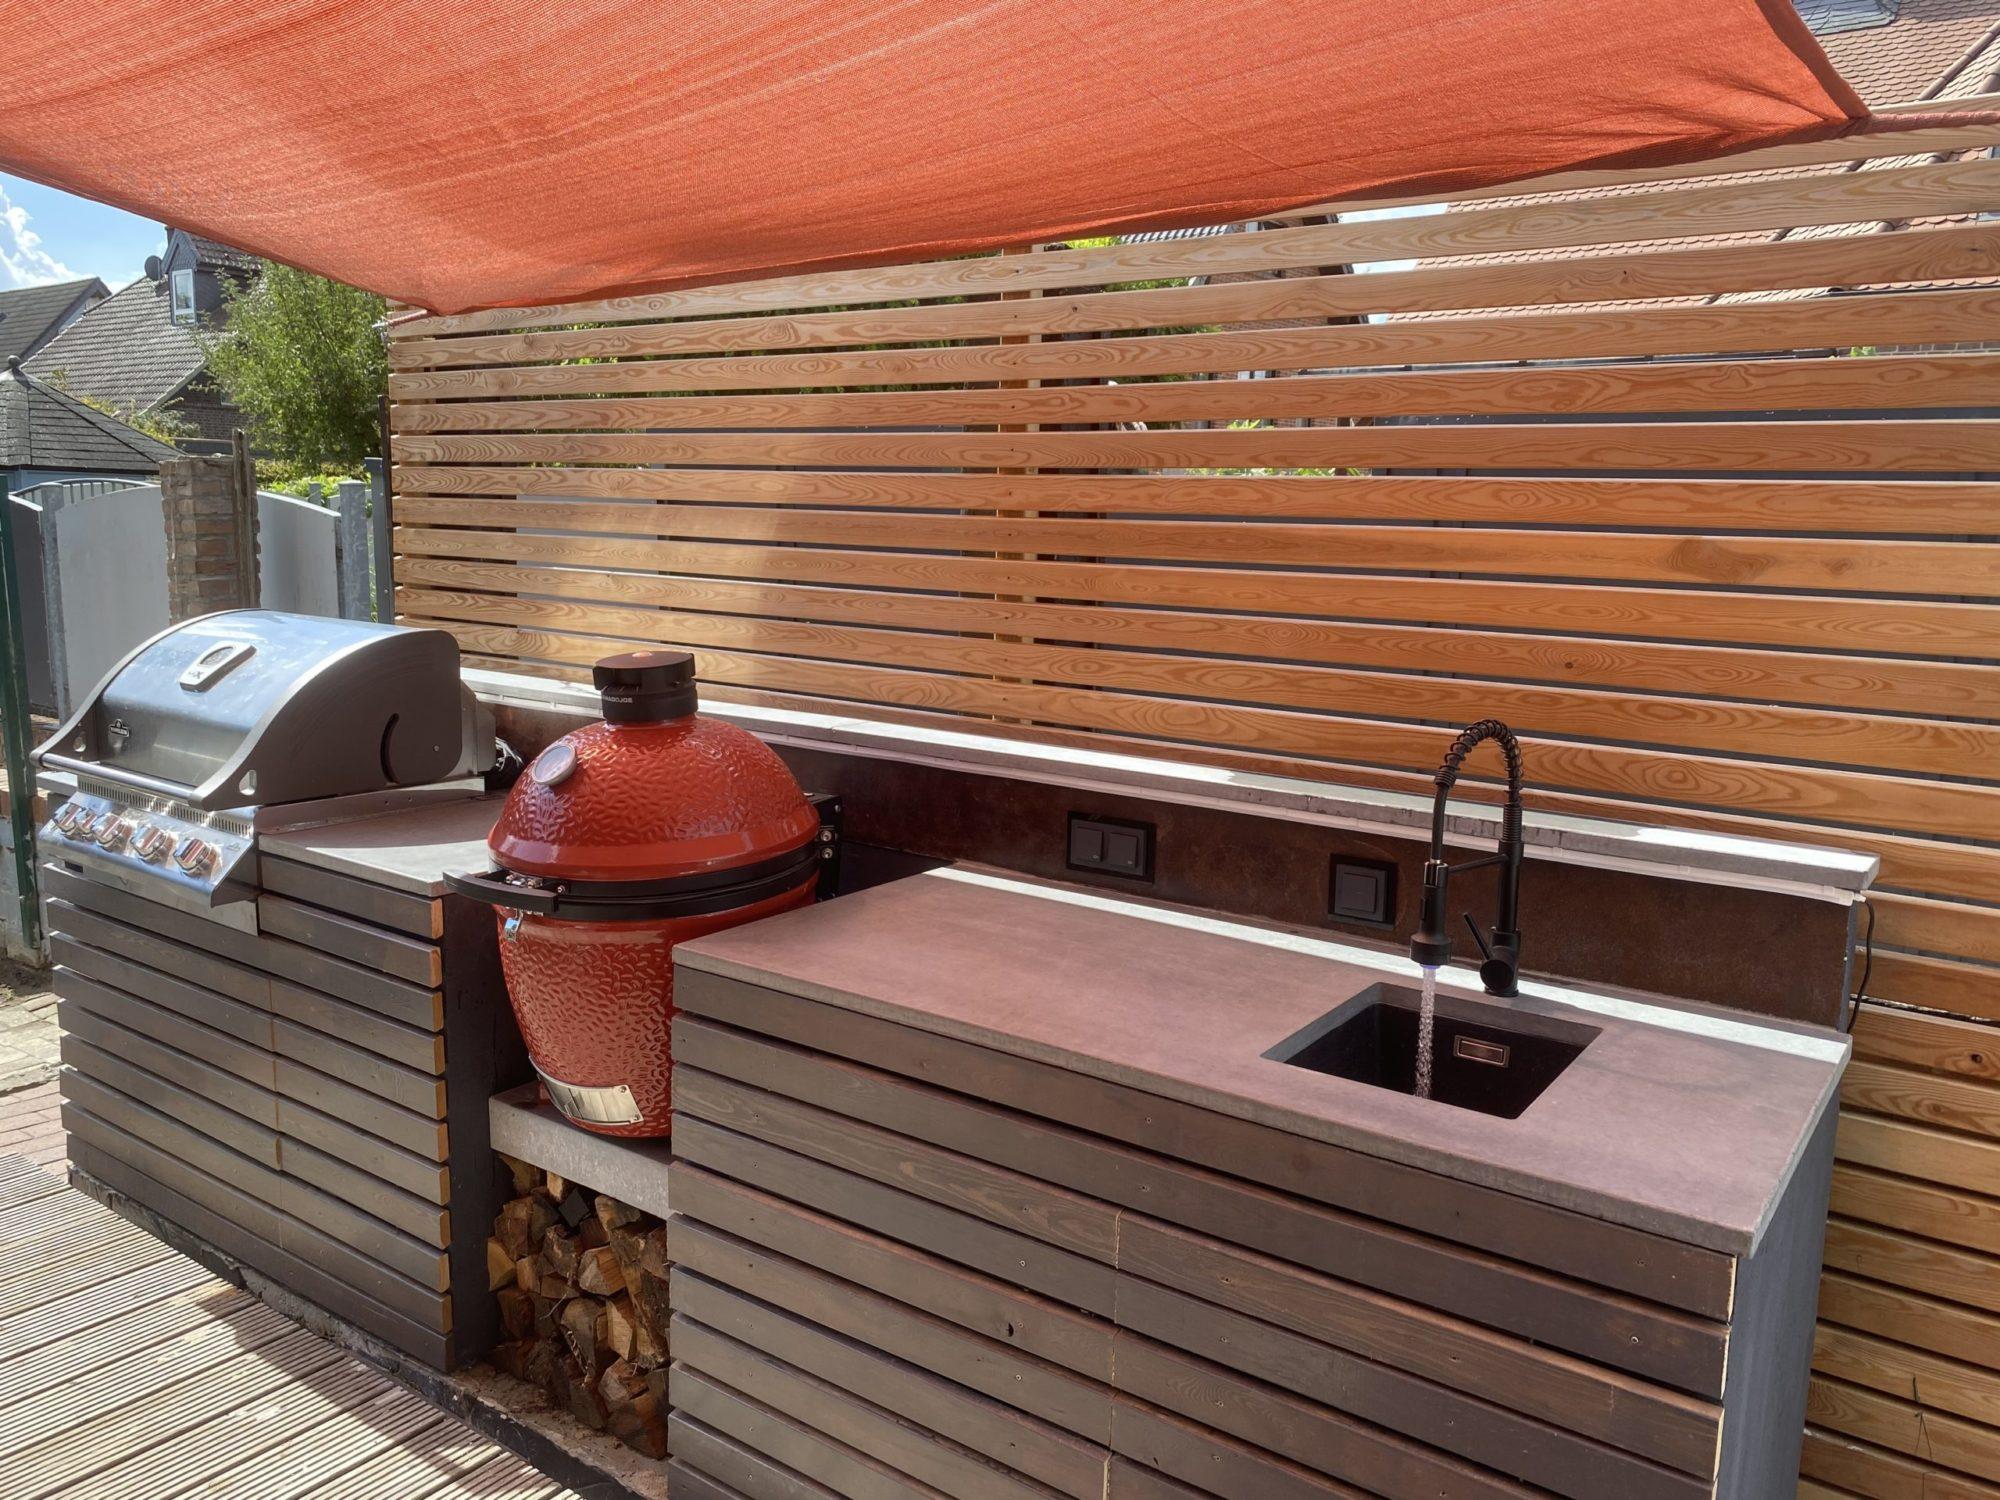 Betonarbeitsplatte Outdoorküche